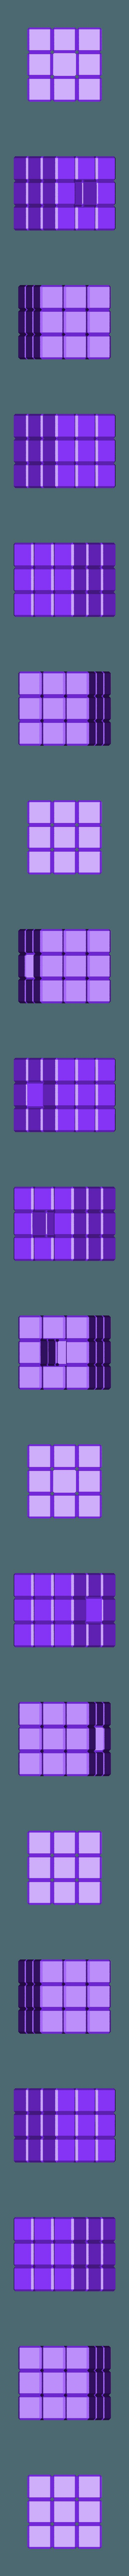 threeBot.stl Download free STL file Nesting Cubes, Recursive Cubes, Cubes within Cubes • 3D printer template, LGBU